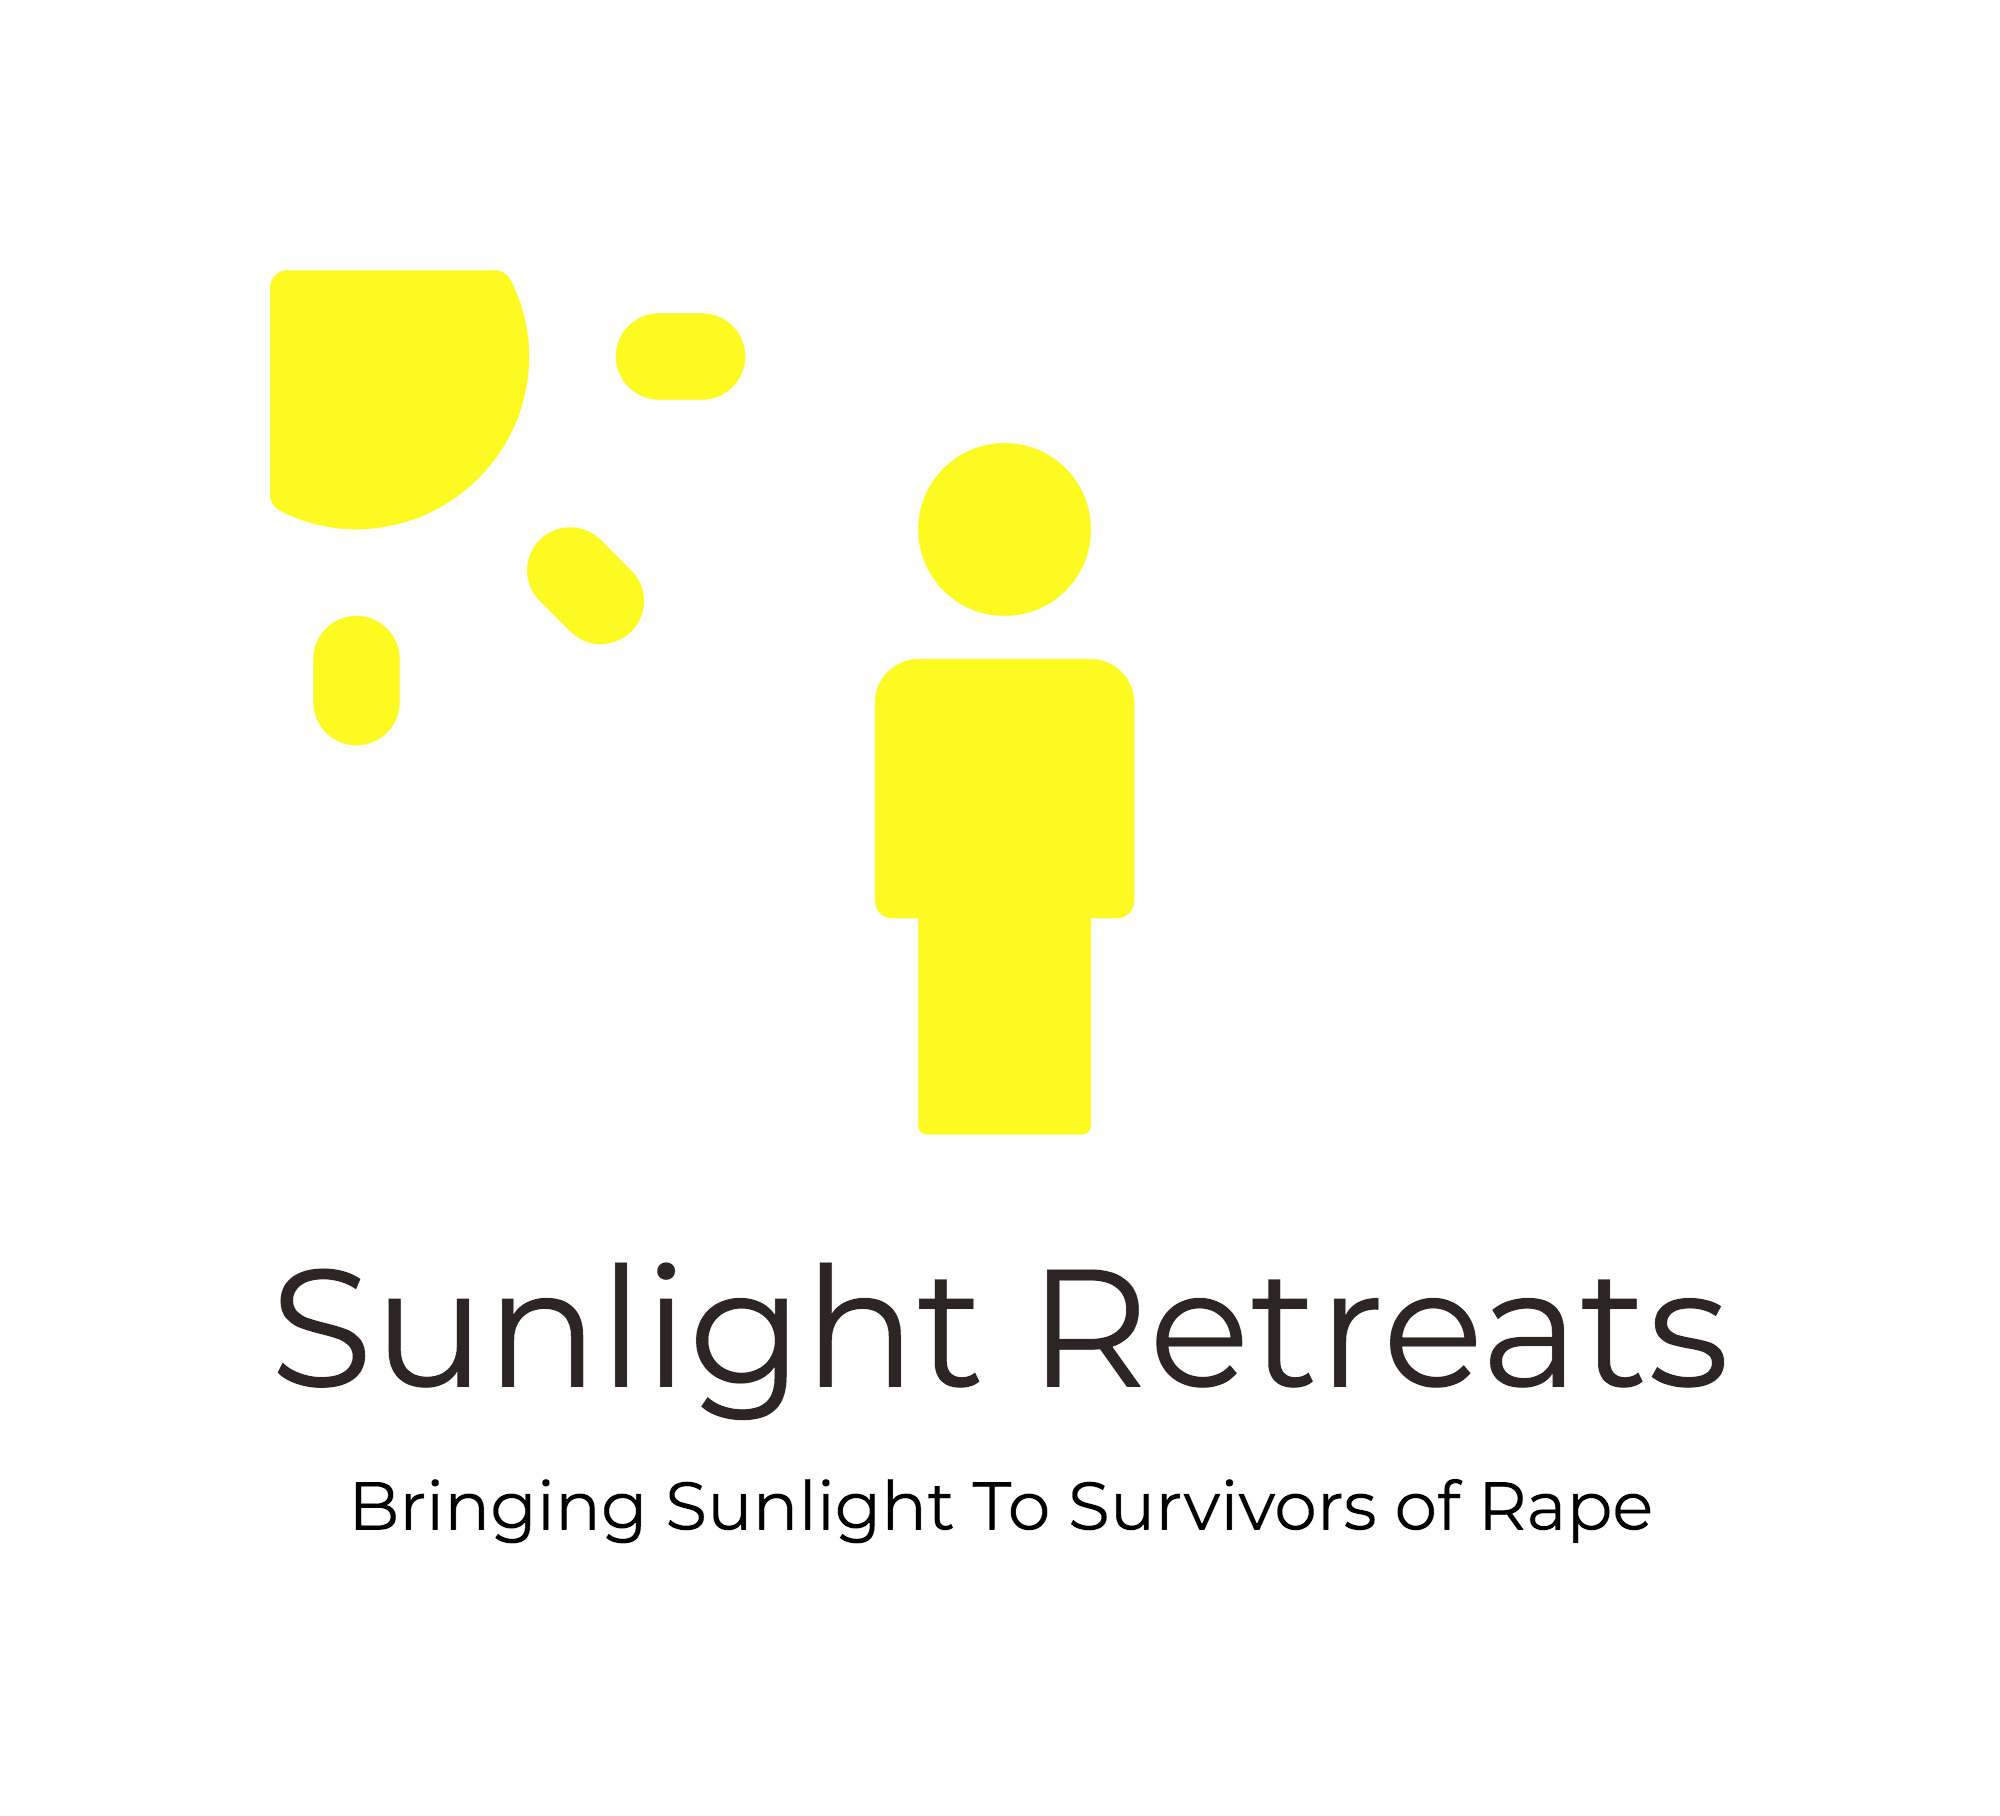 Sunlight Retreats-logo (1).png